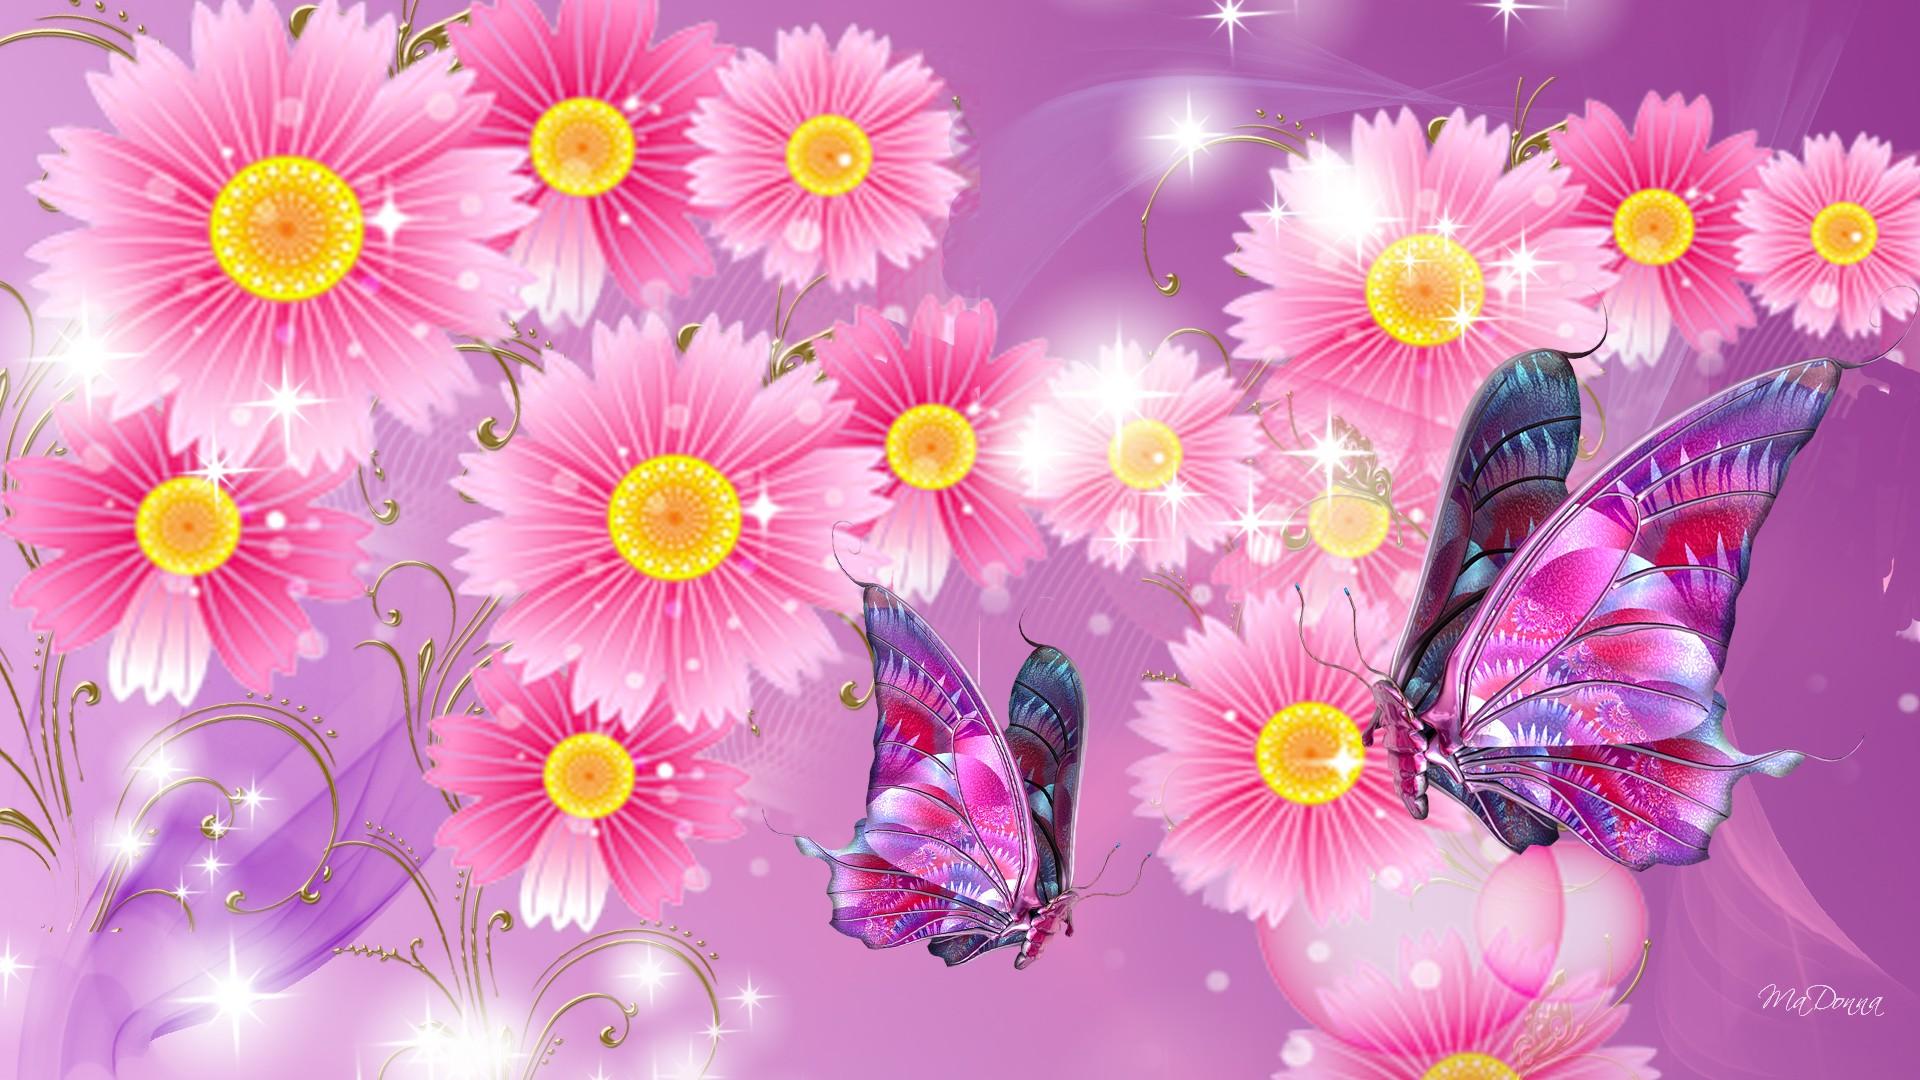 Fiori Wallpaper.0 Pink Butterfly Wallpapers Group Pink Butterfly Wallpapers